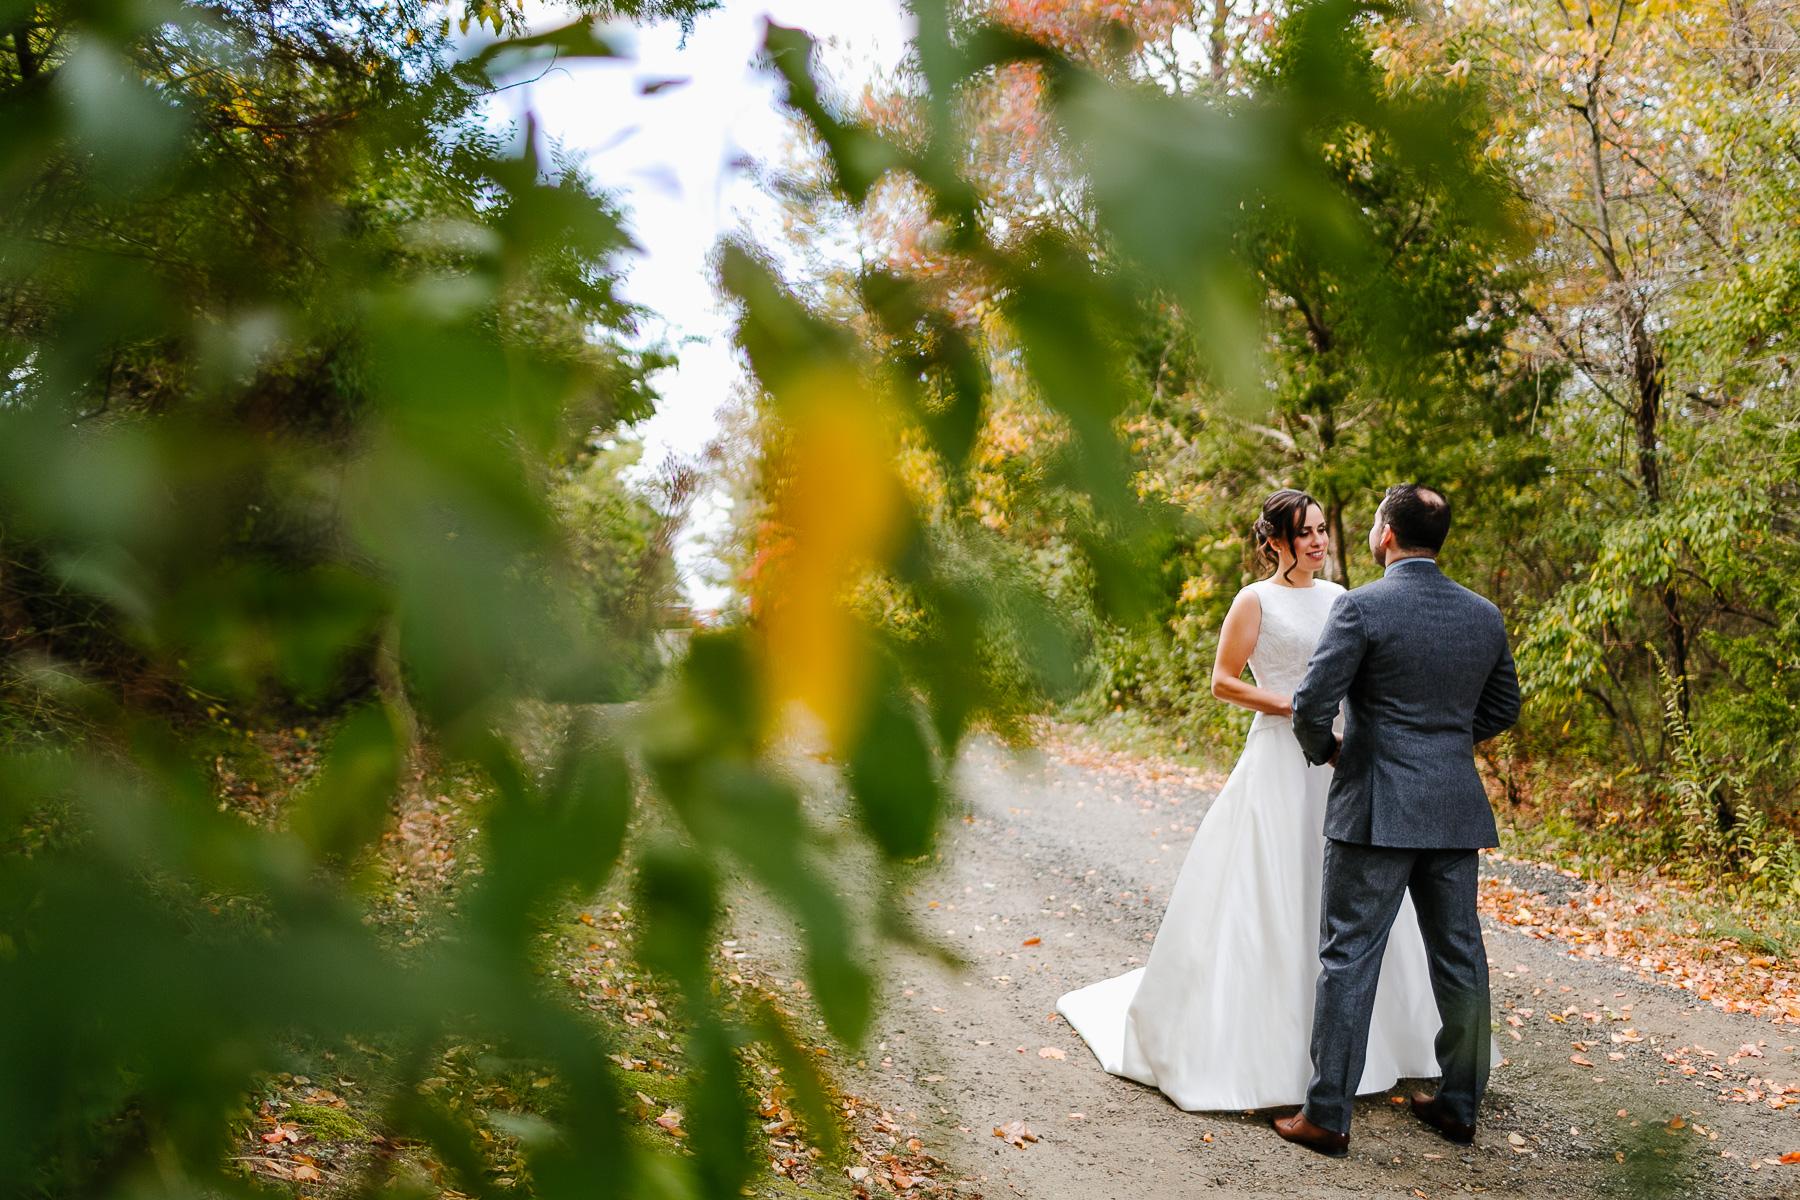 17-Laurita Winery Wedding New Jersey Wedding Photographer Laurita Winery Weddings Longbrook Photography.jpg